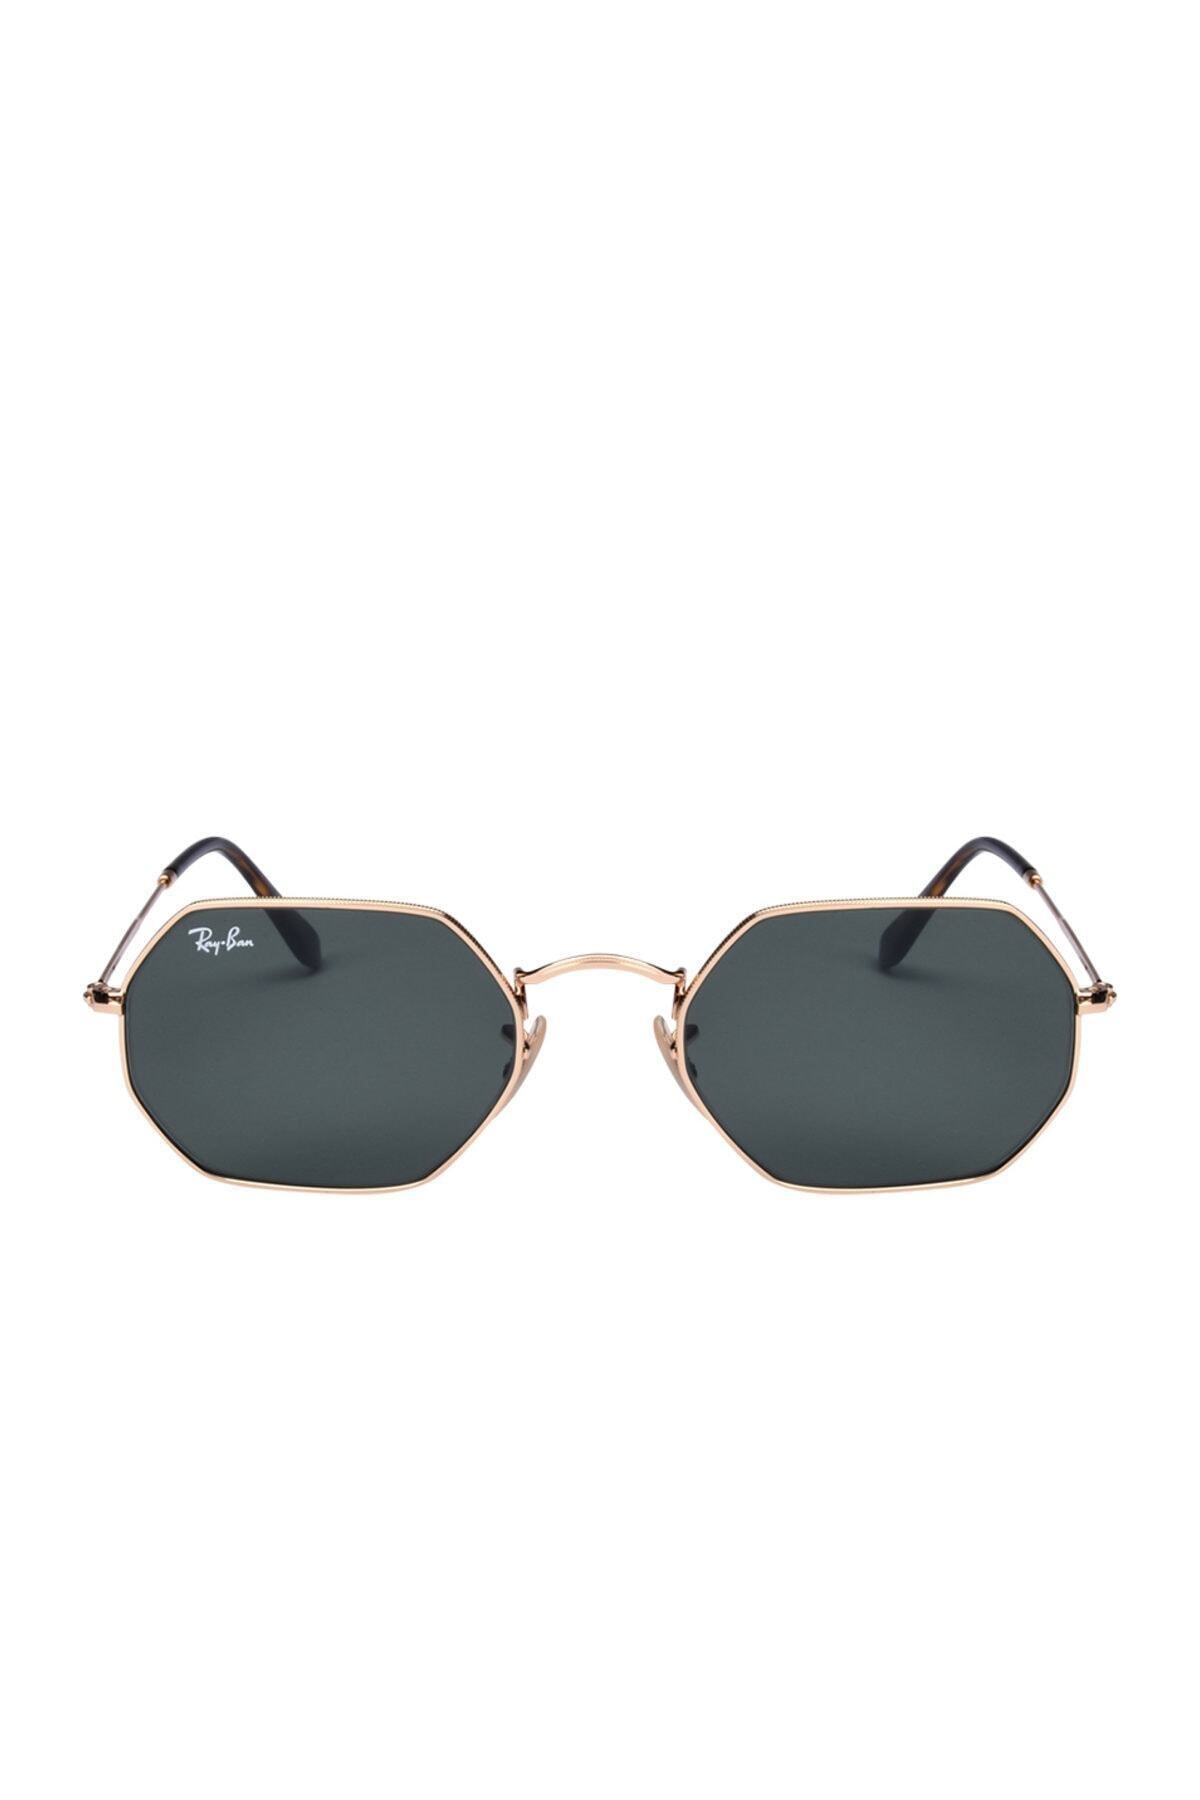 عینک آفتابی شیک برند ری بن کد ty731444